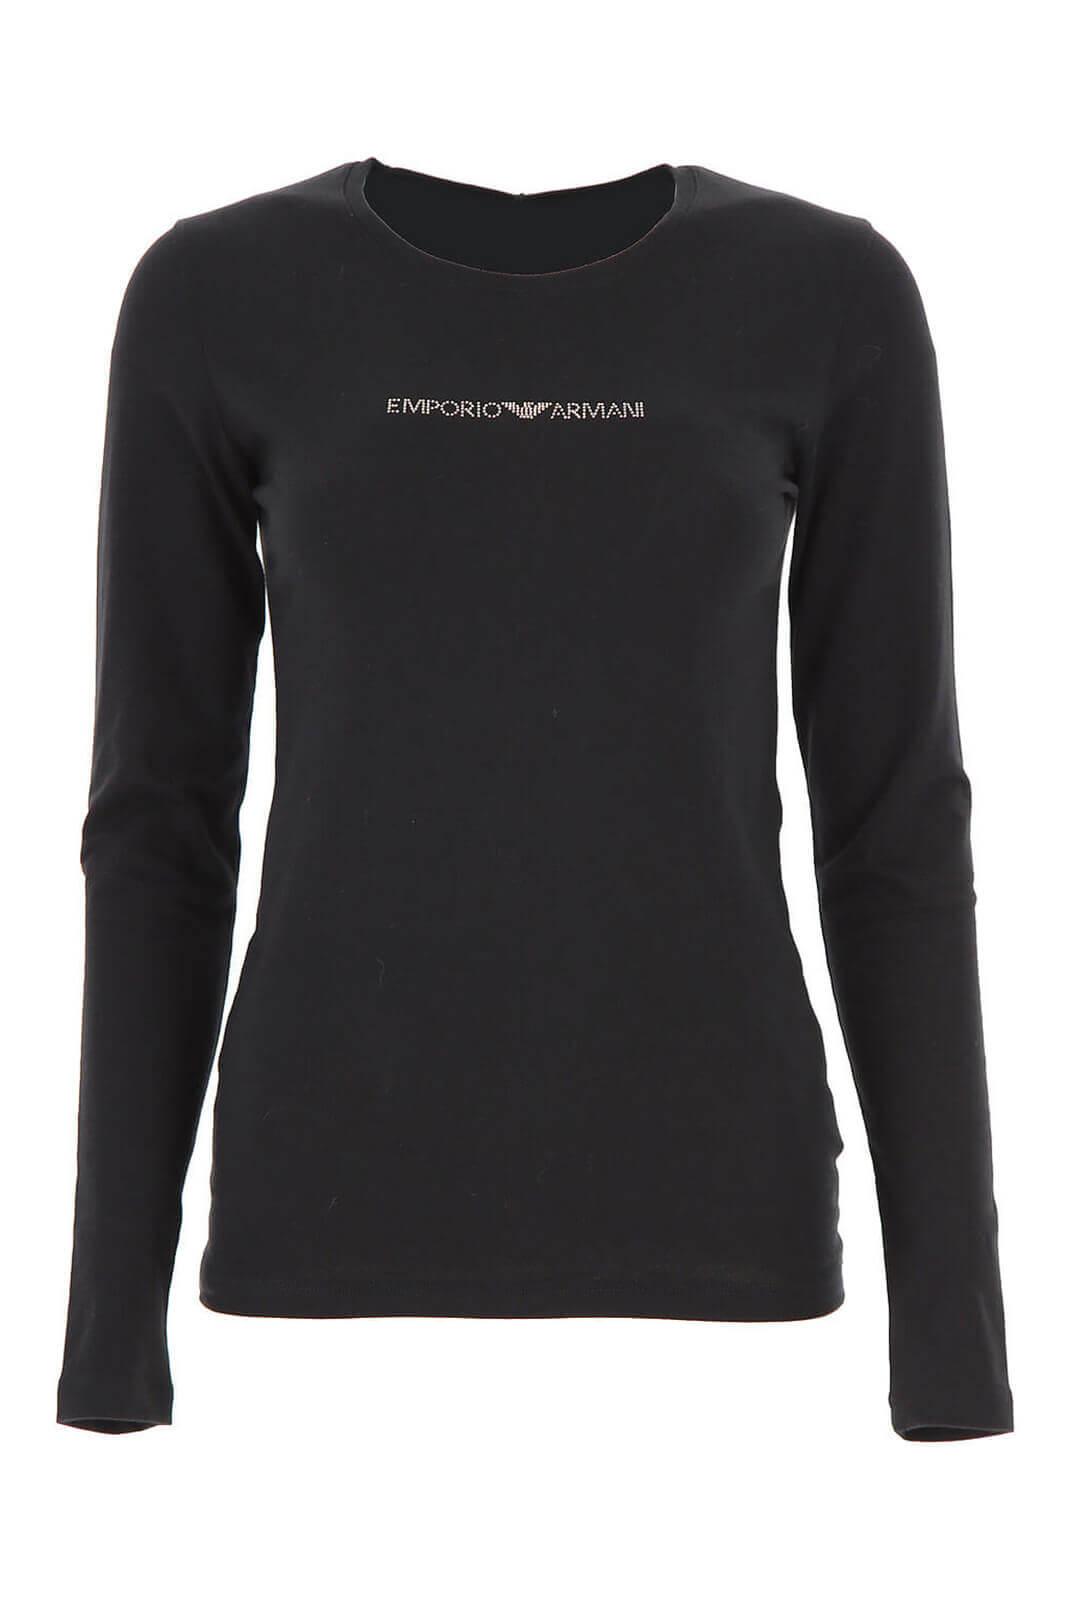 Tee shirt manches longues  Emporio armani 163229 9A263 020 BLACK